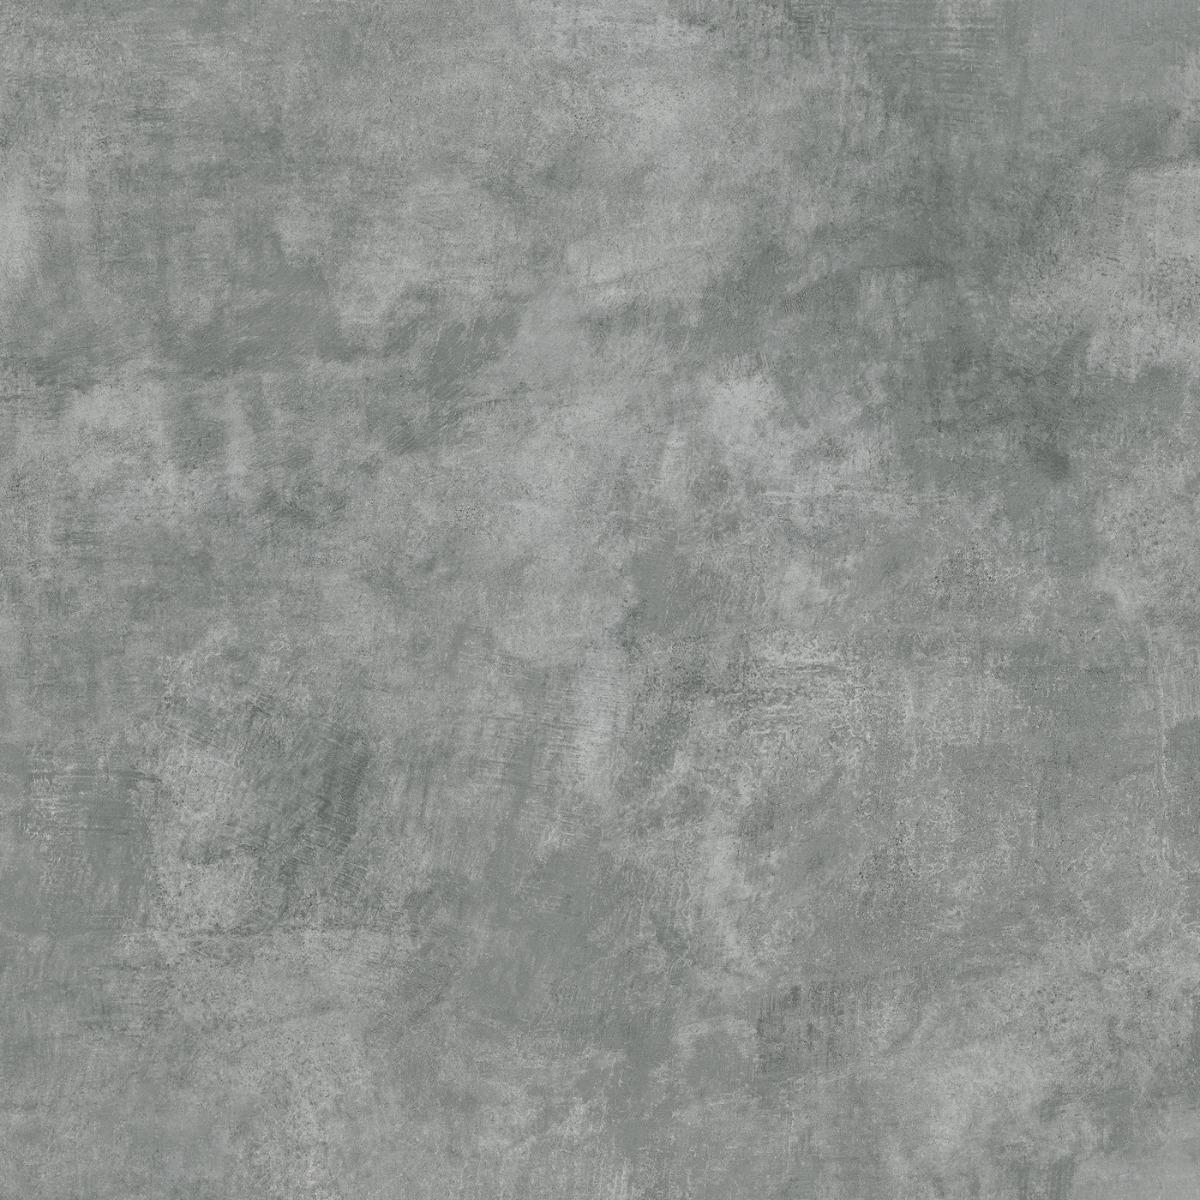 HN DGVT Smoky Grey Dark